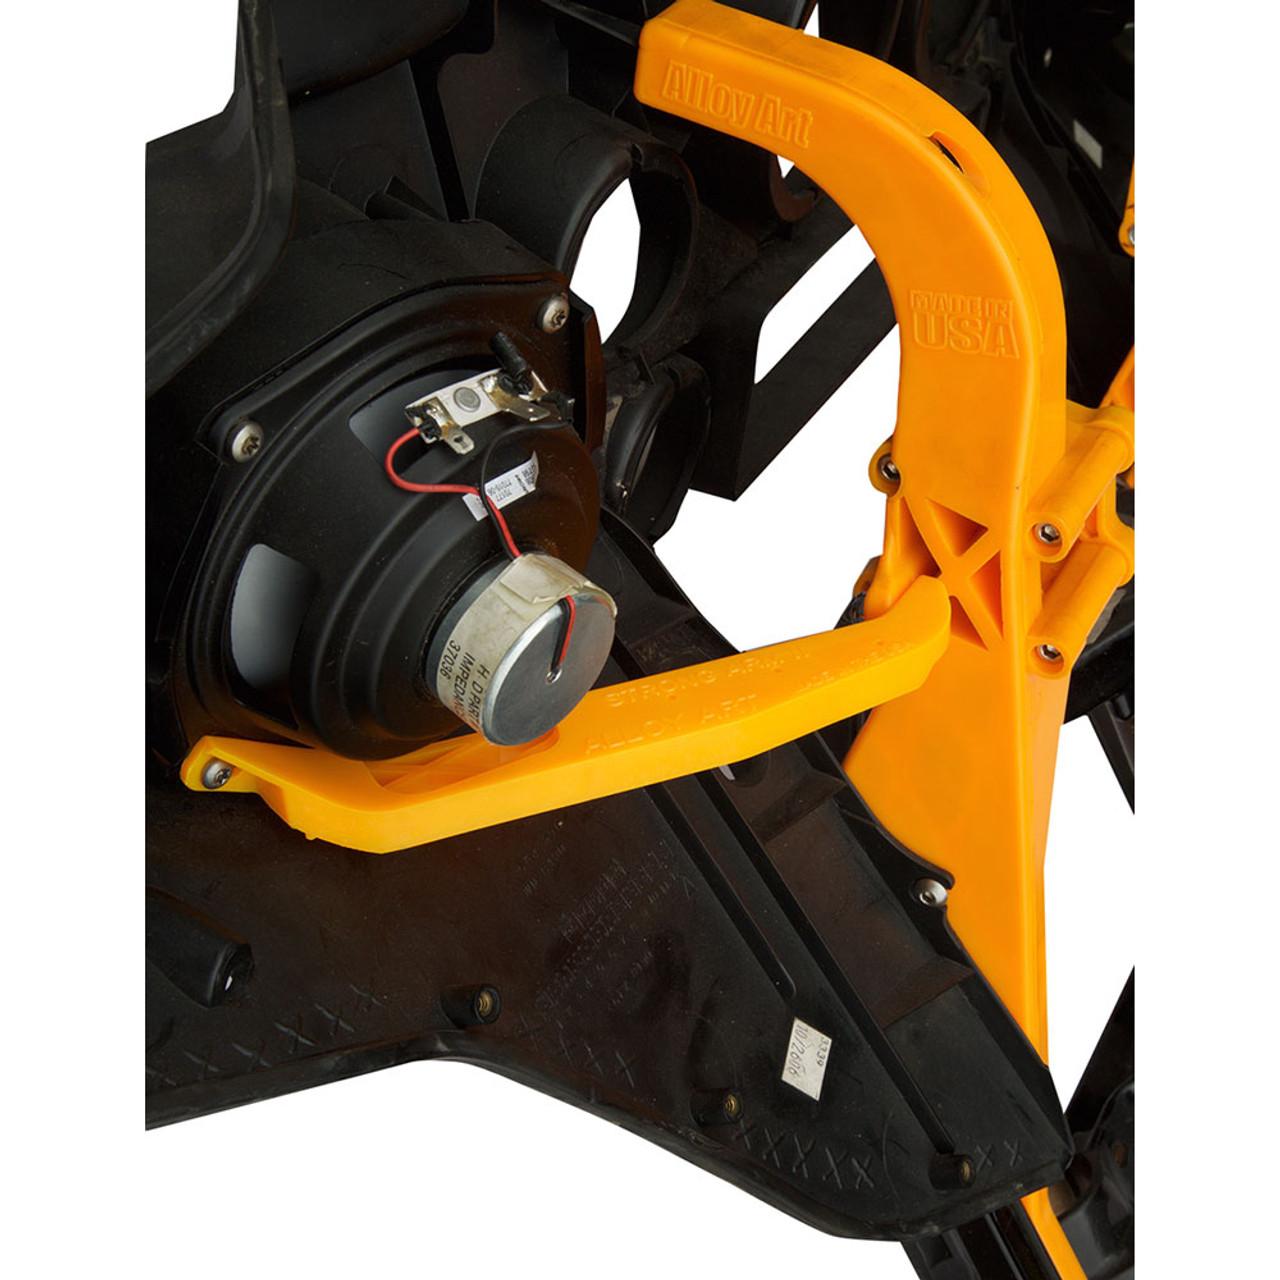 Heavy Duty Inner Fairing Support Bracket Plated for Harley Electra Street Glide